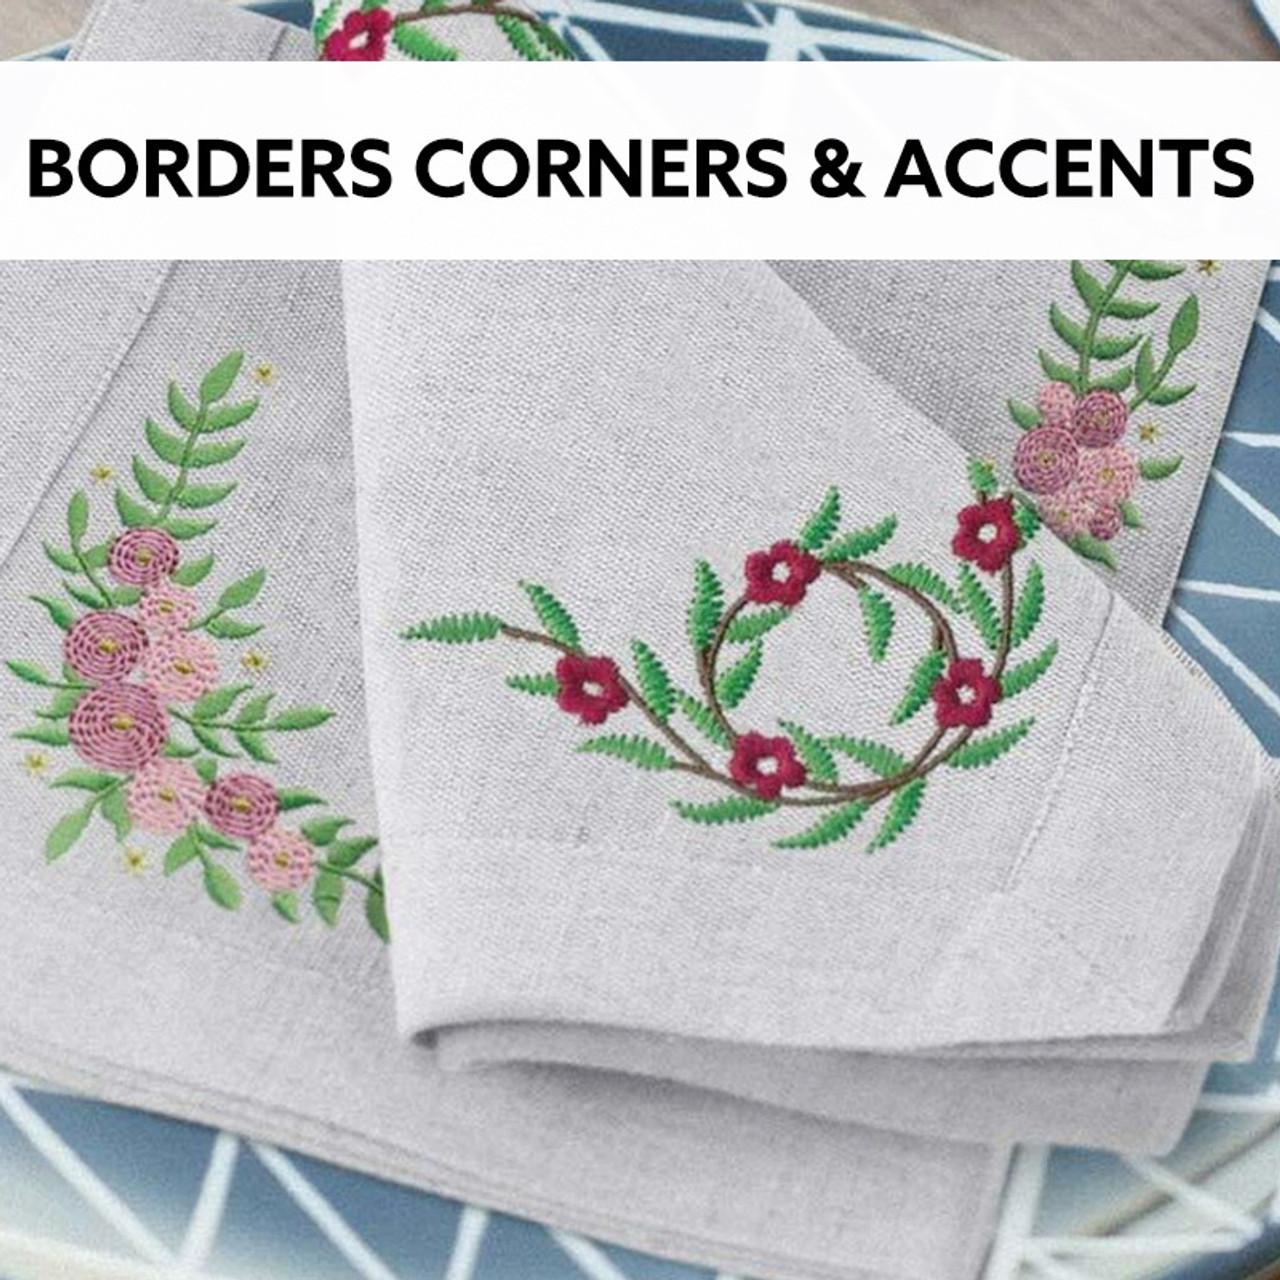 Borders Corners & Accents